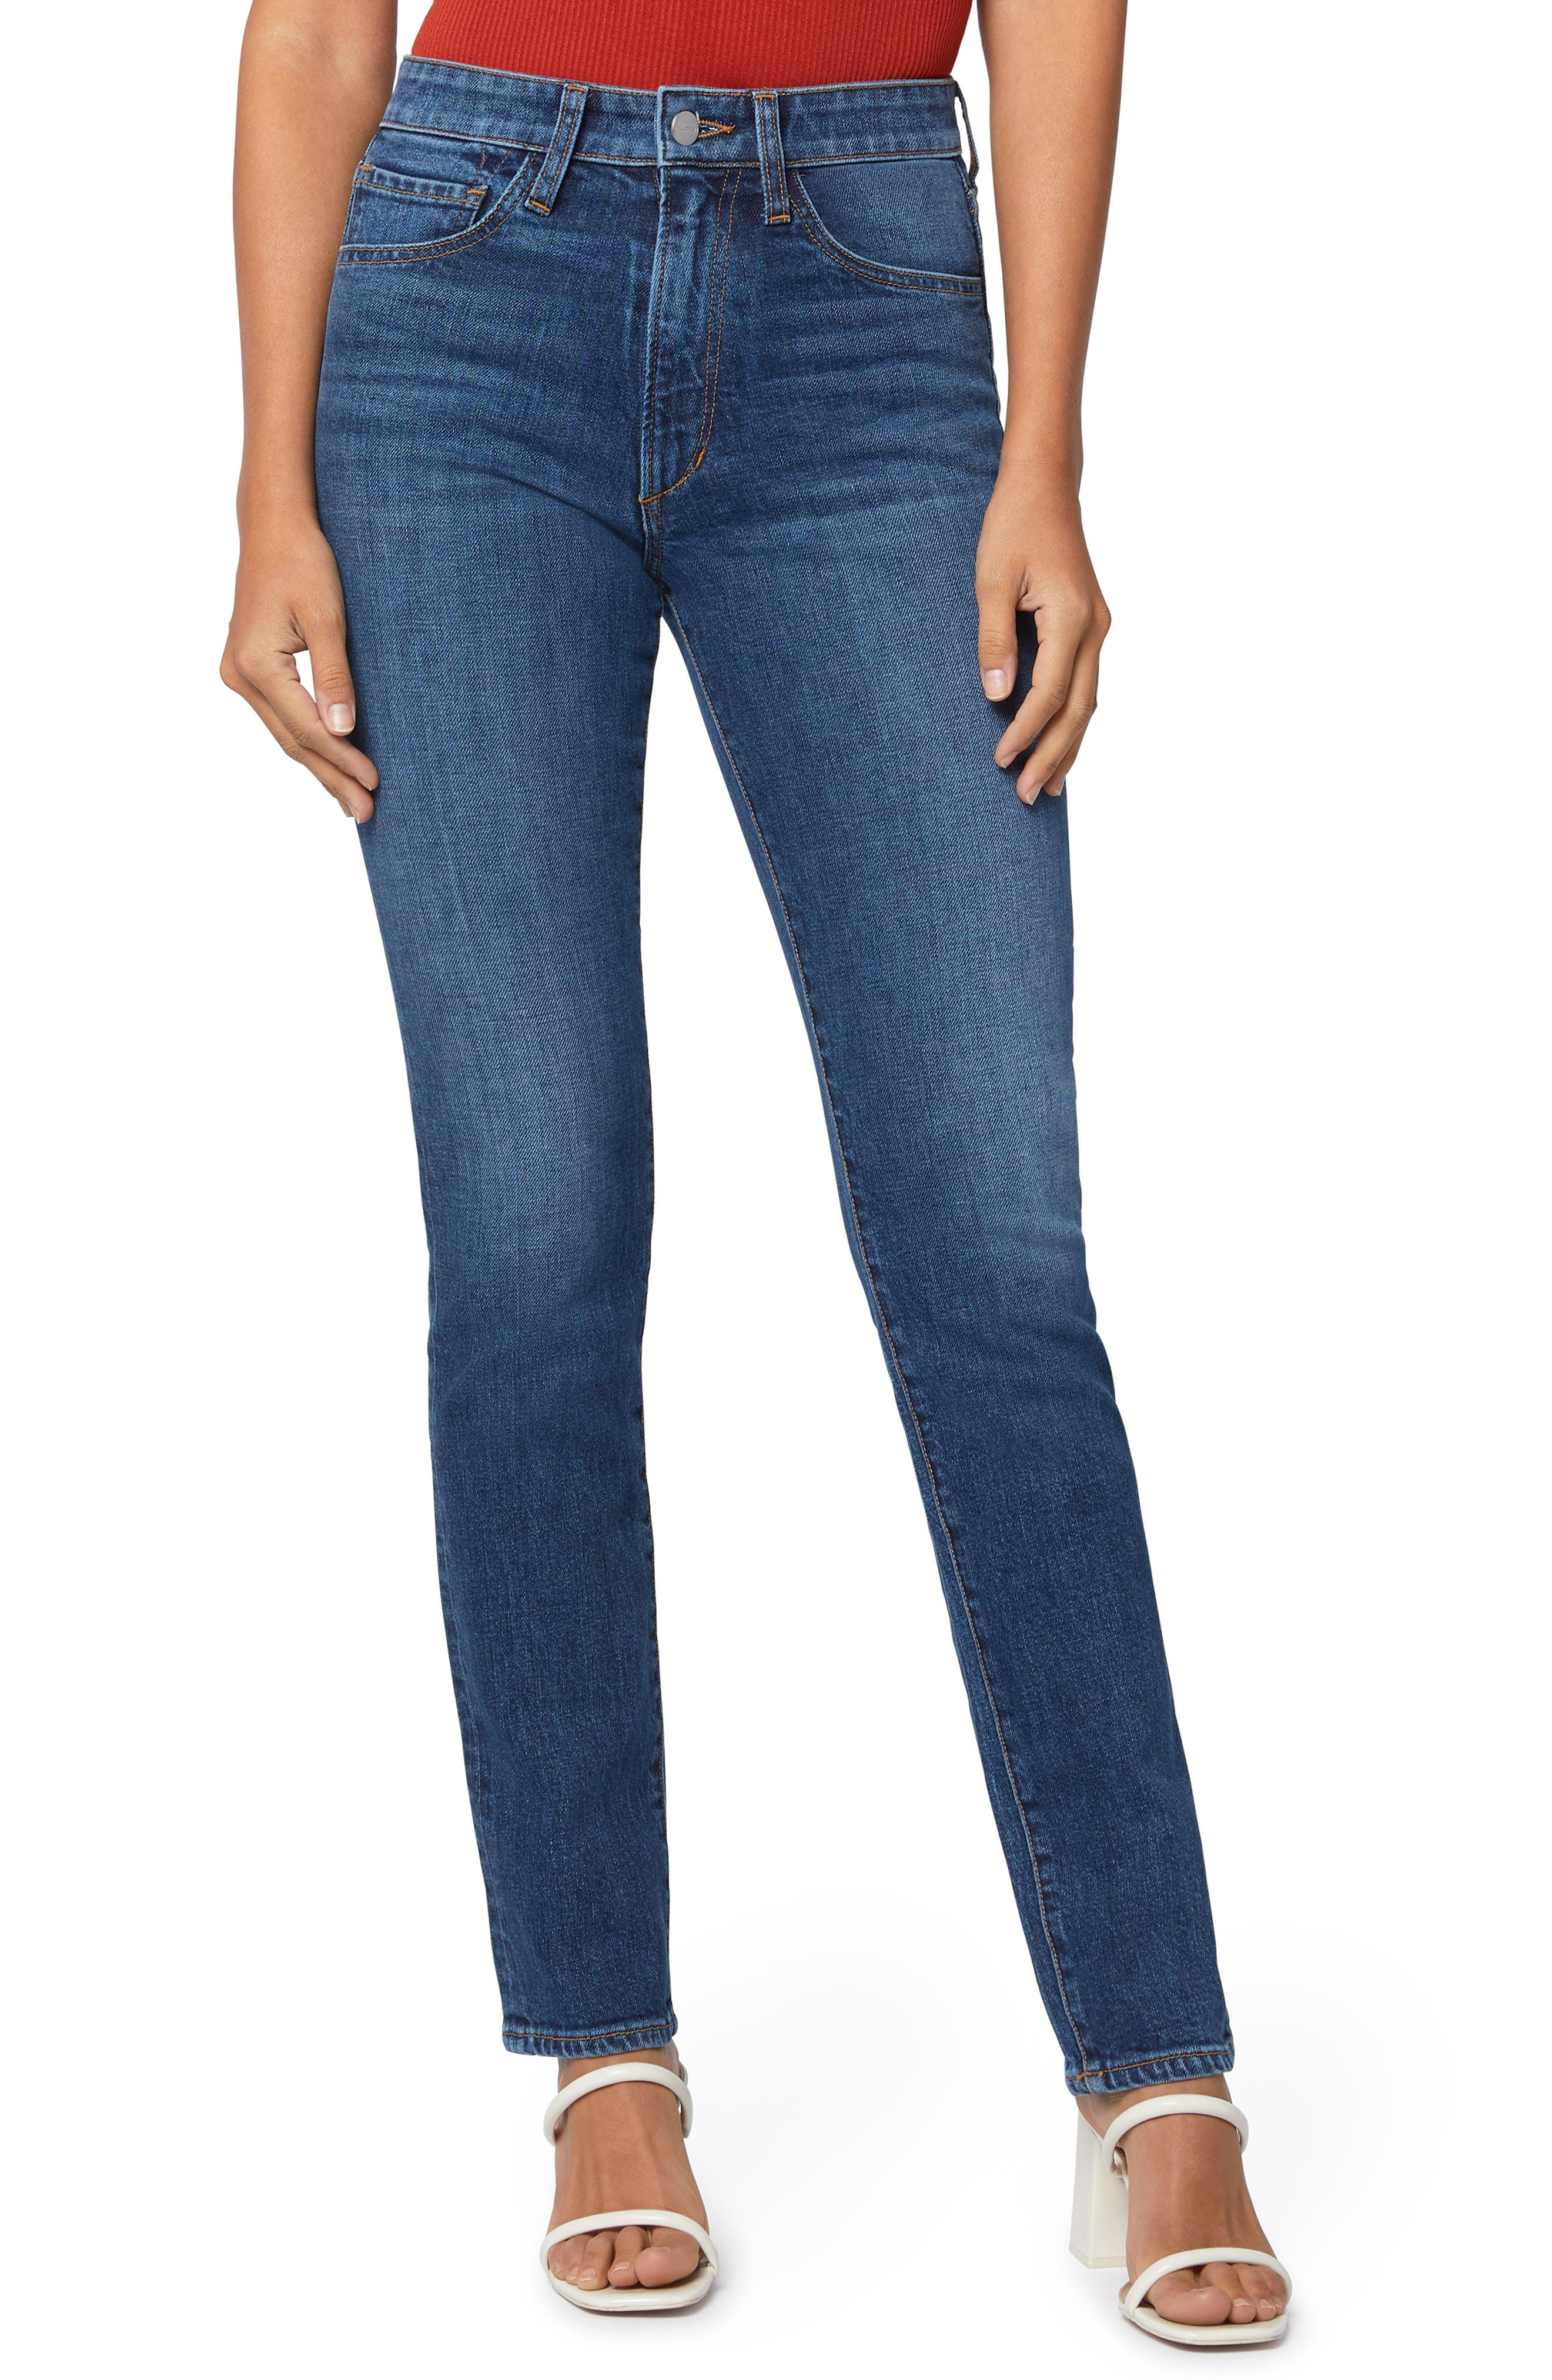 Image of Joe's Jeans The Luna Straight Leg Jeans